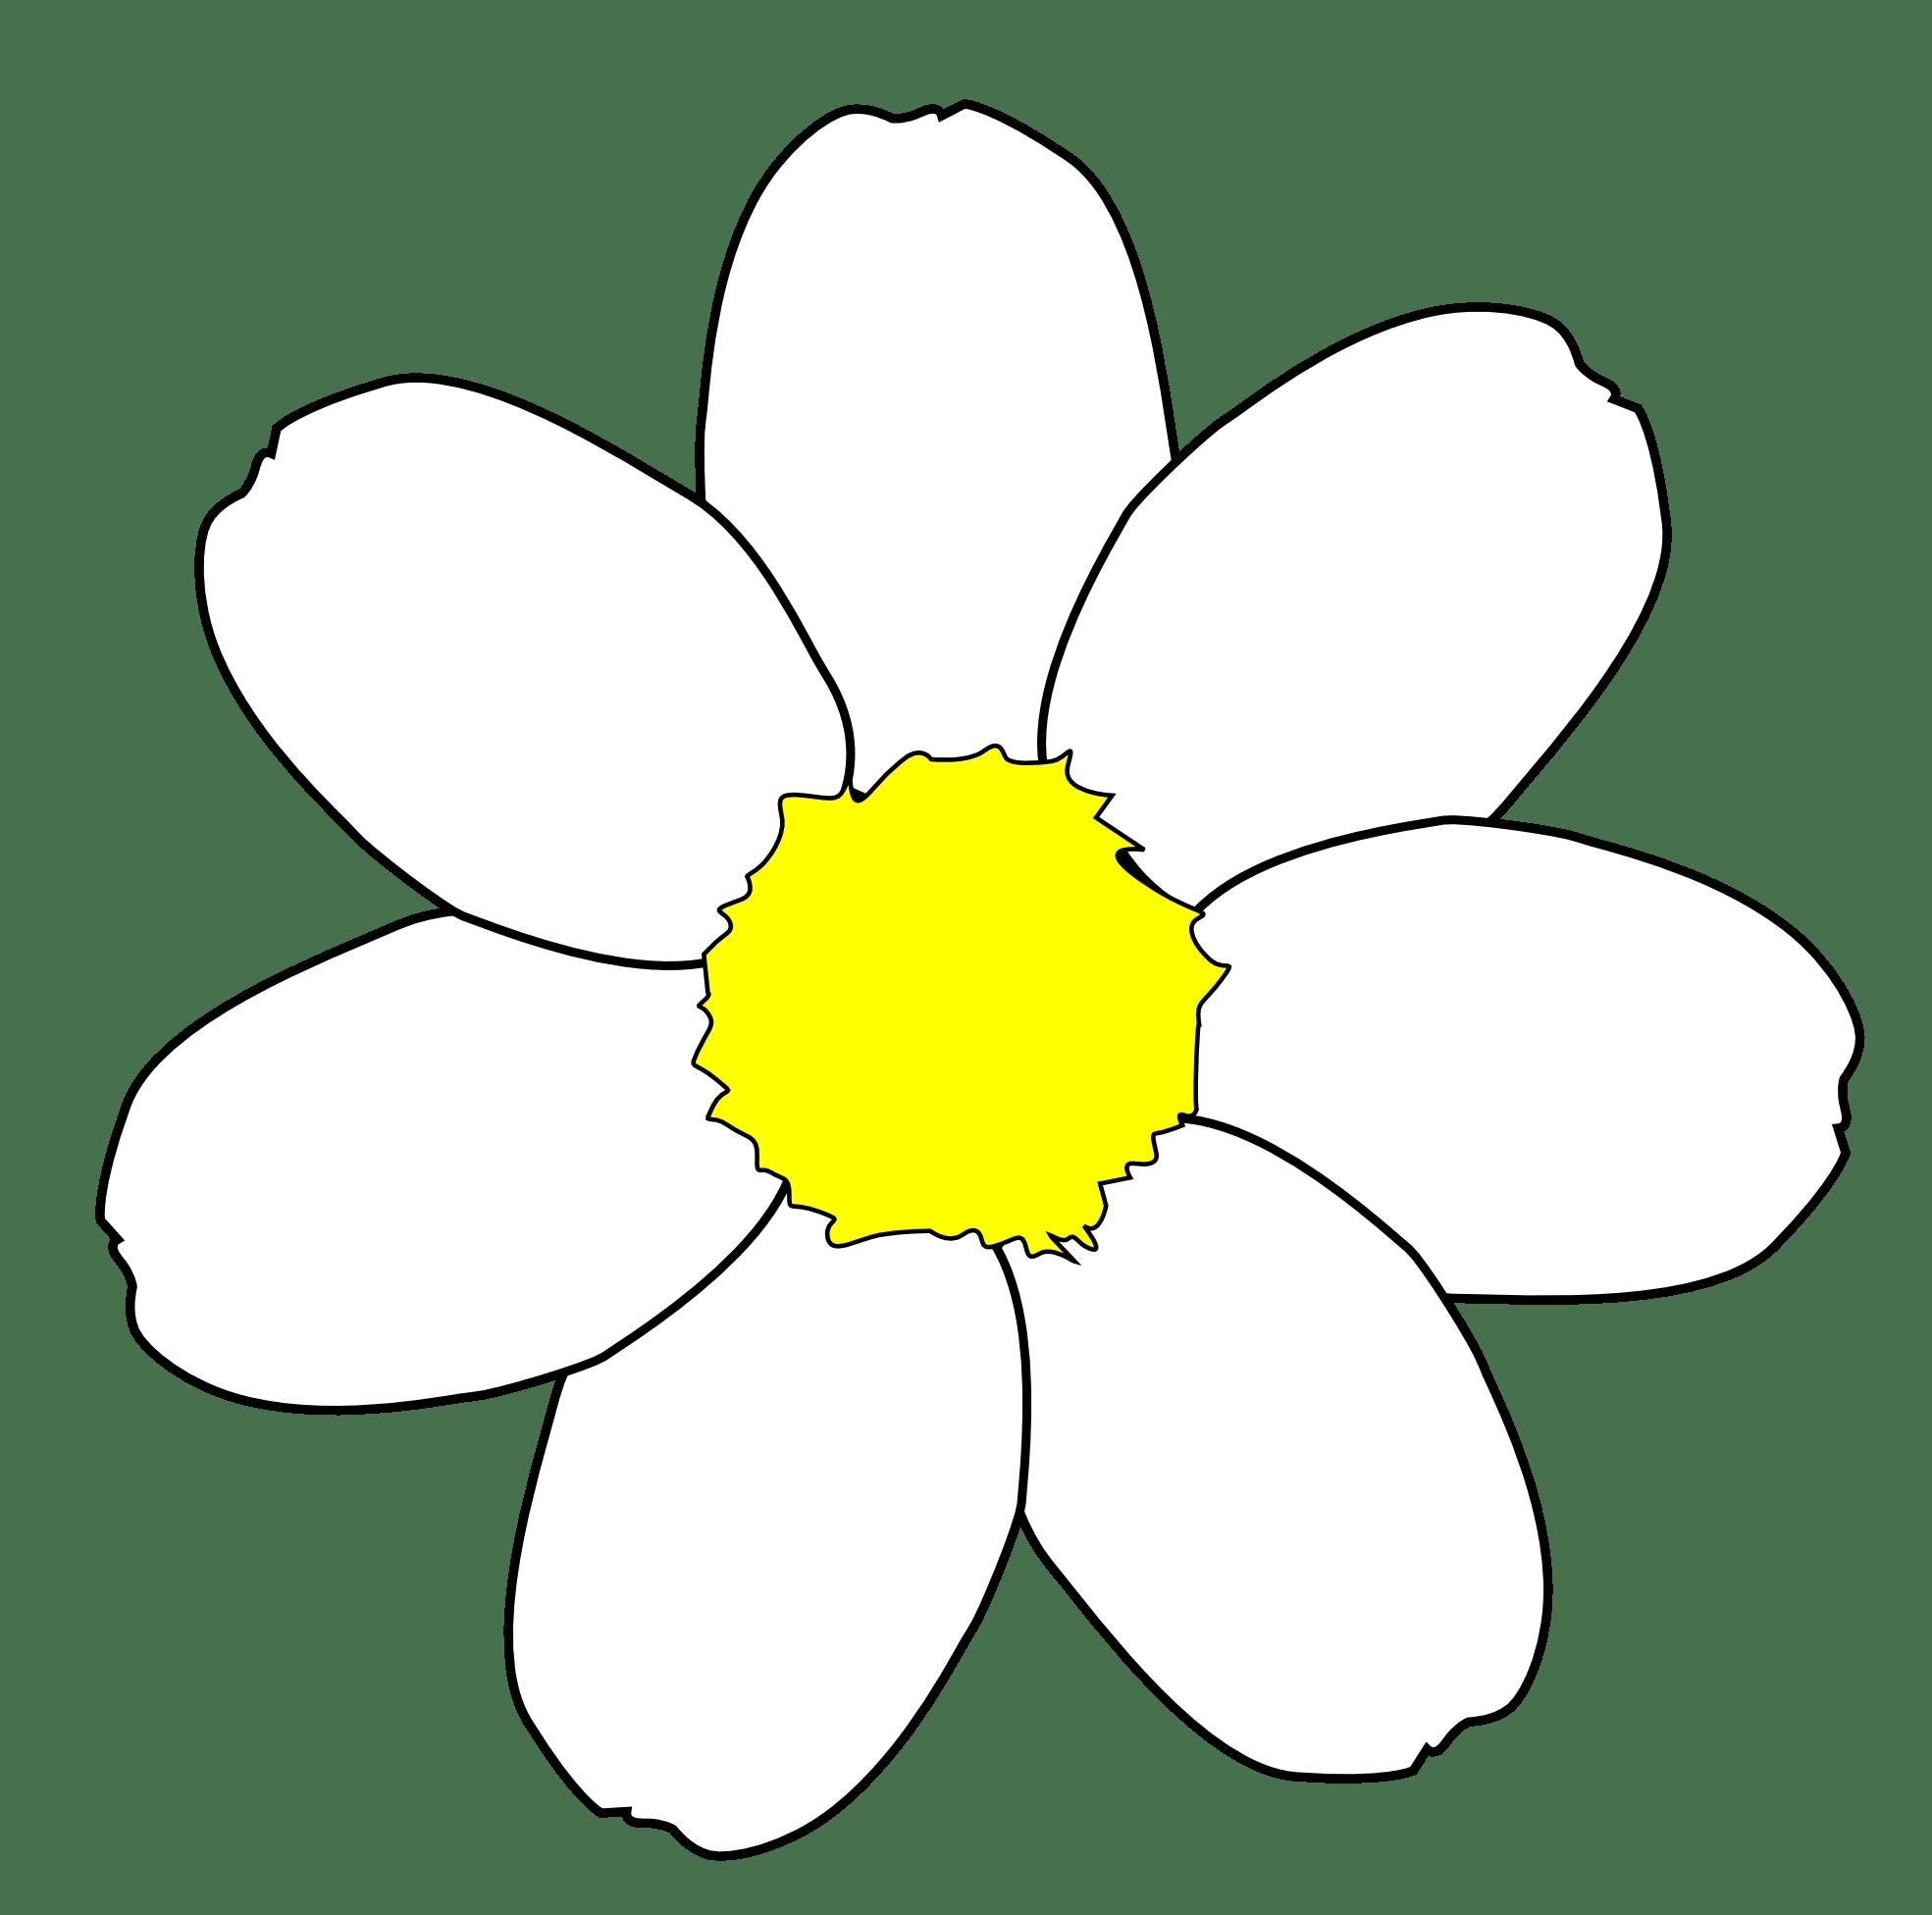 Daisy Flower Outline - ClipArt Best (1969 x 1952 Pixel)